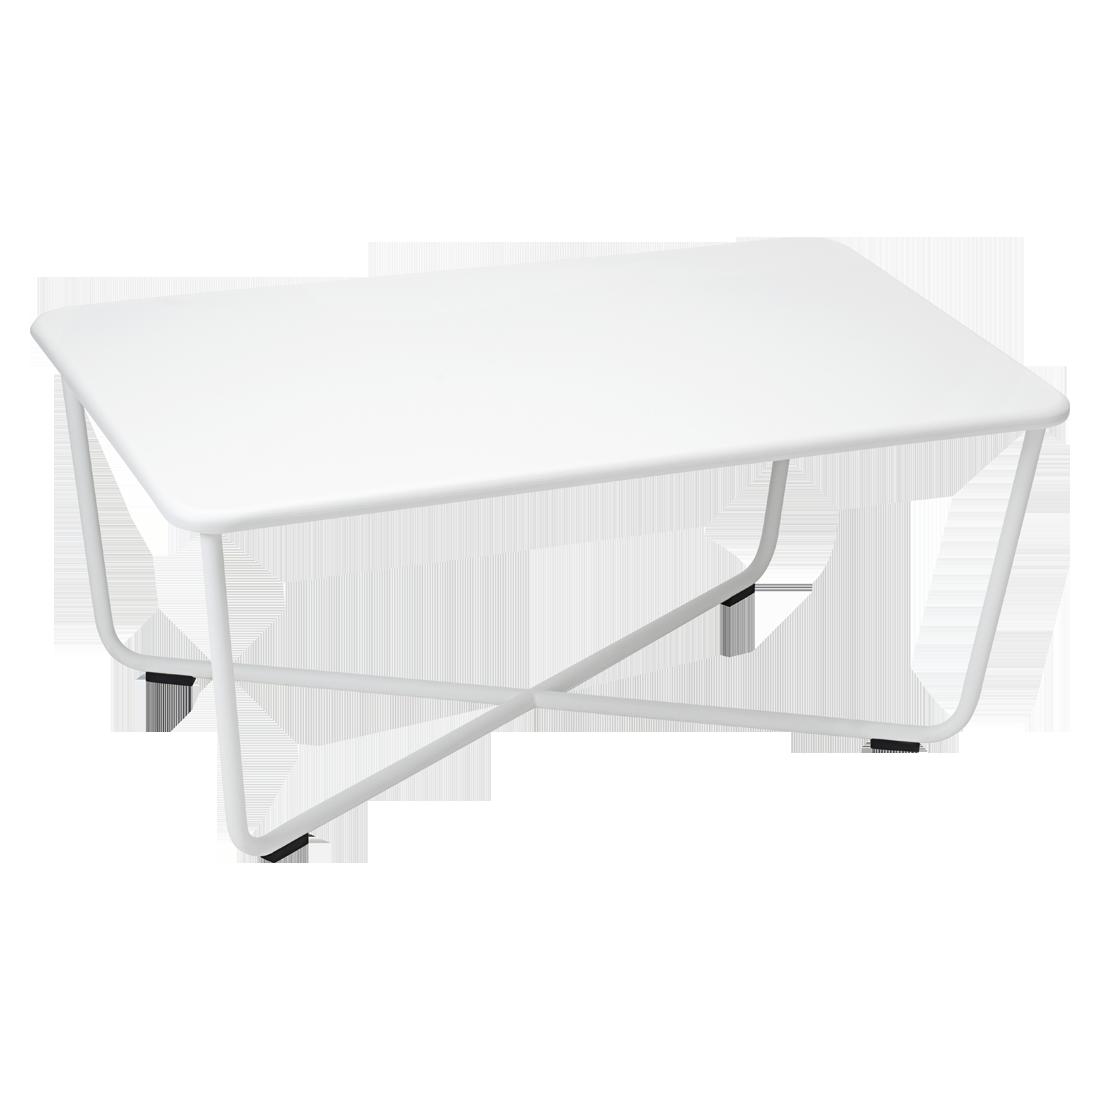 table basse metal, table basse de jardin, table basse blanche